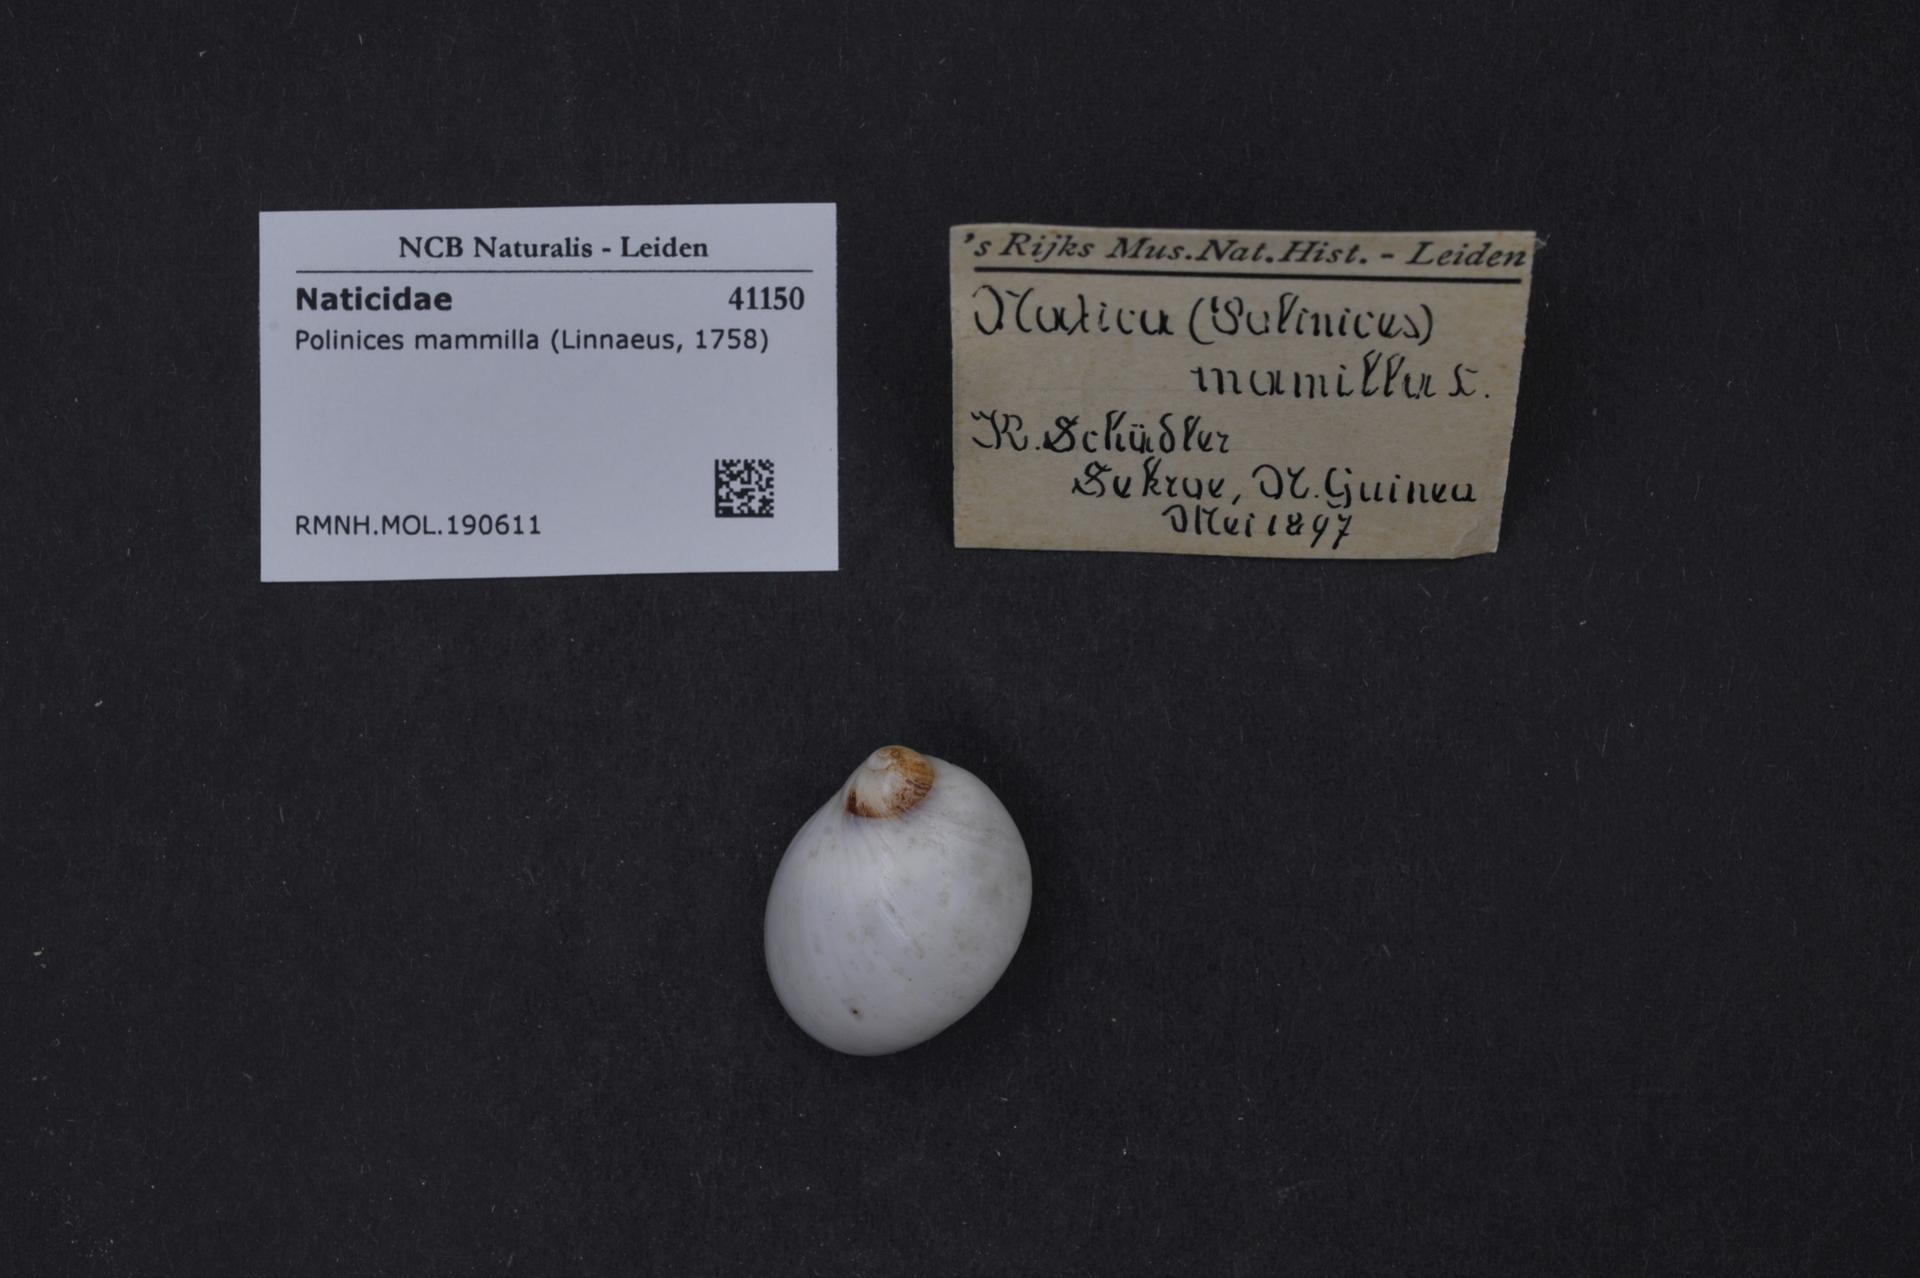 RMNH.MOL.190611 | Polinices mammilla (Linnaeus, 1758)